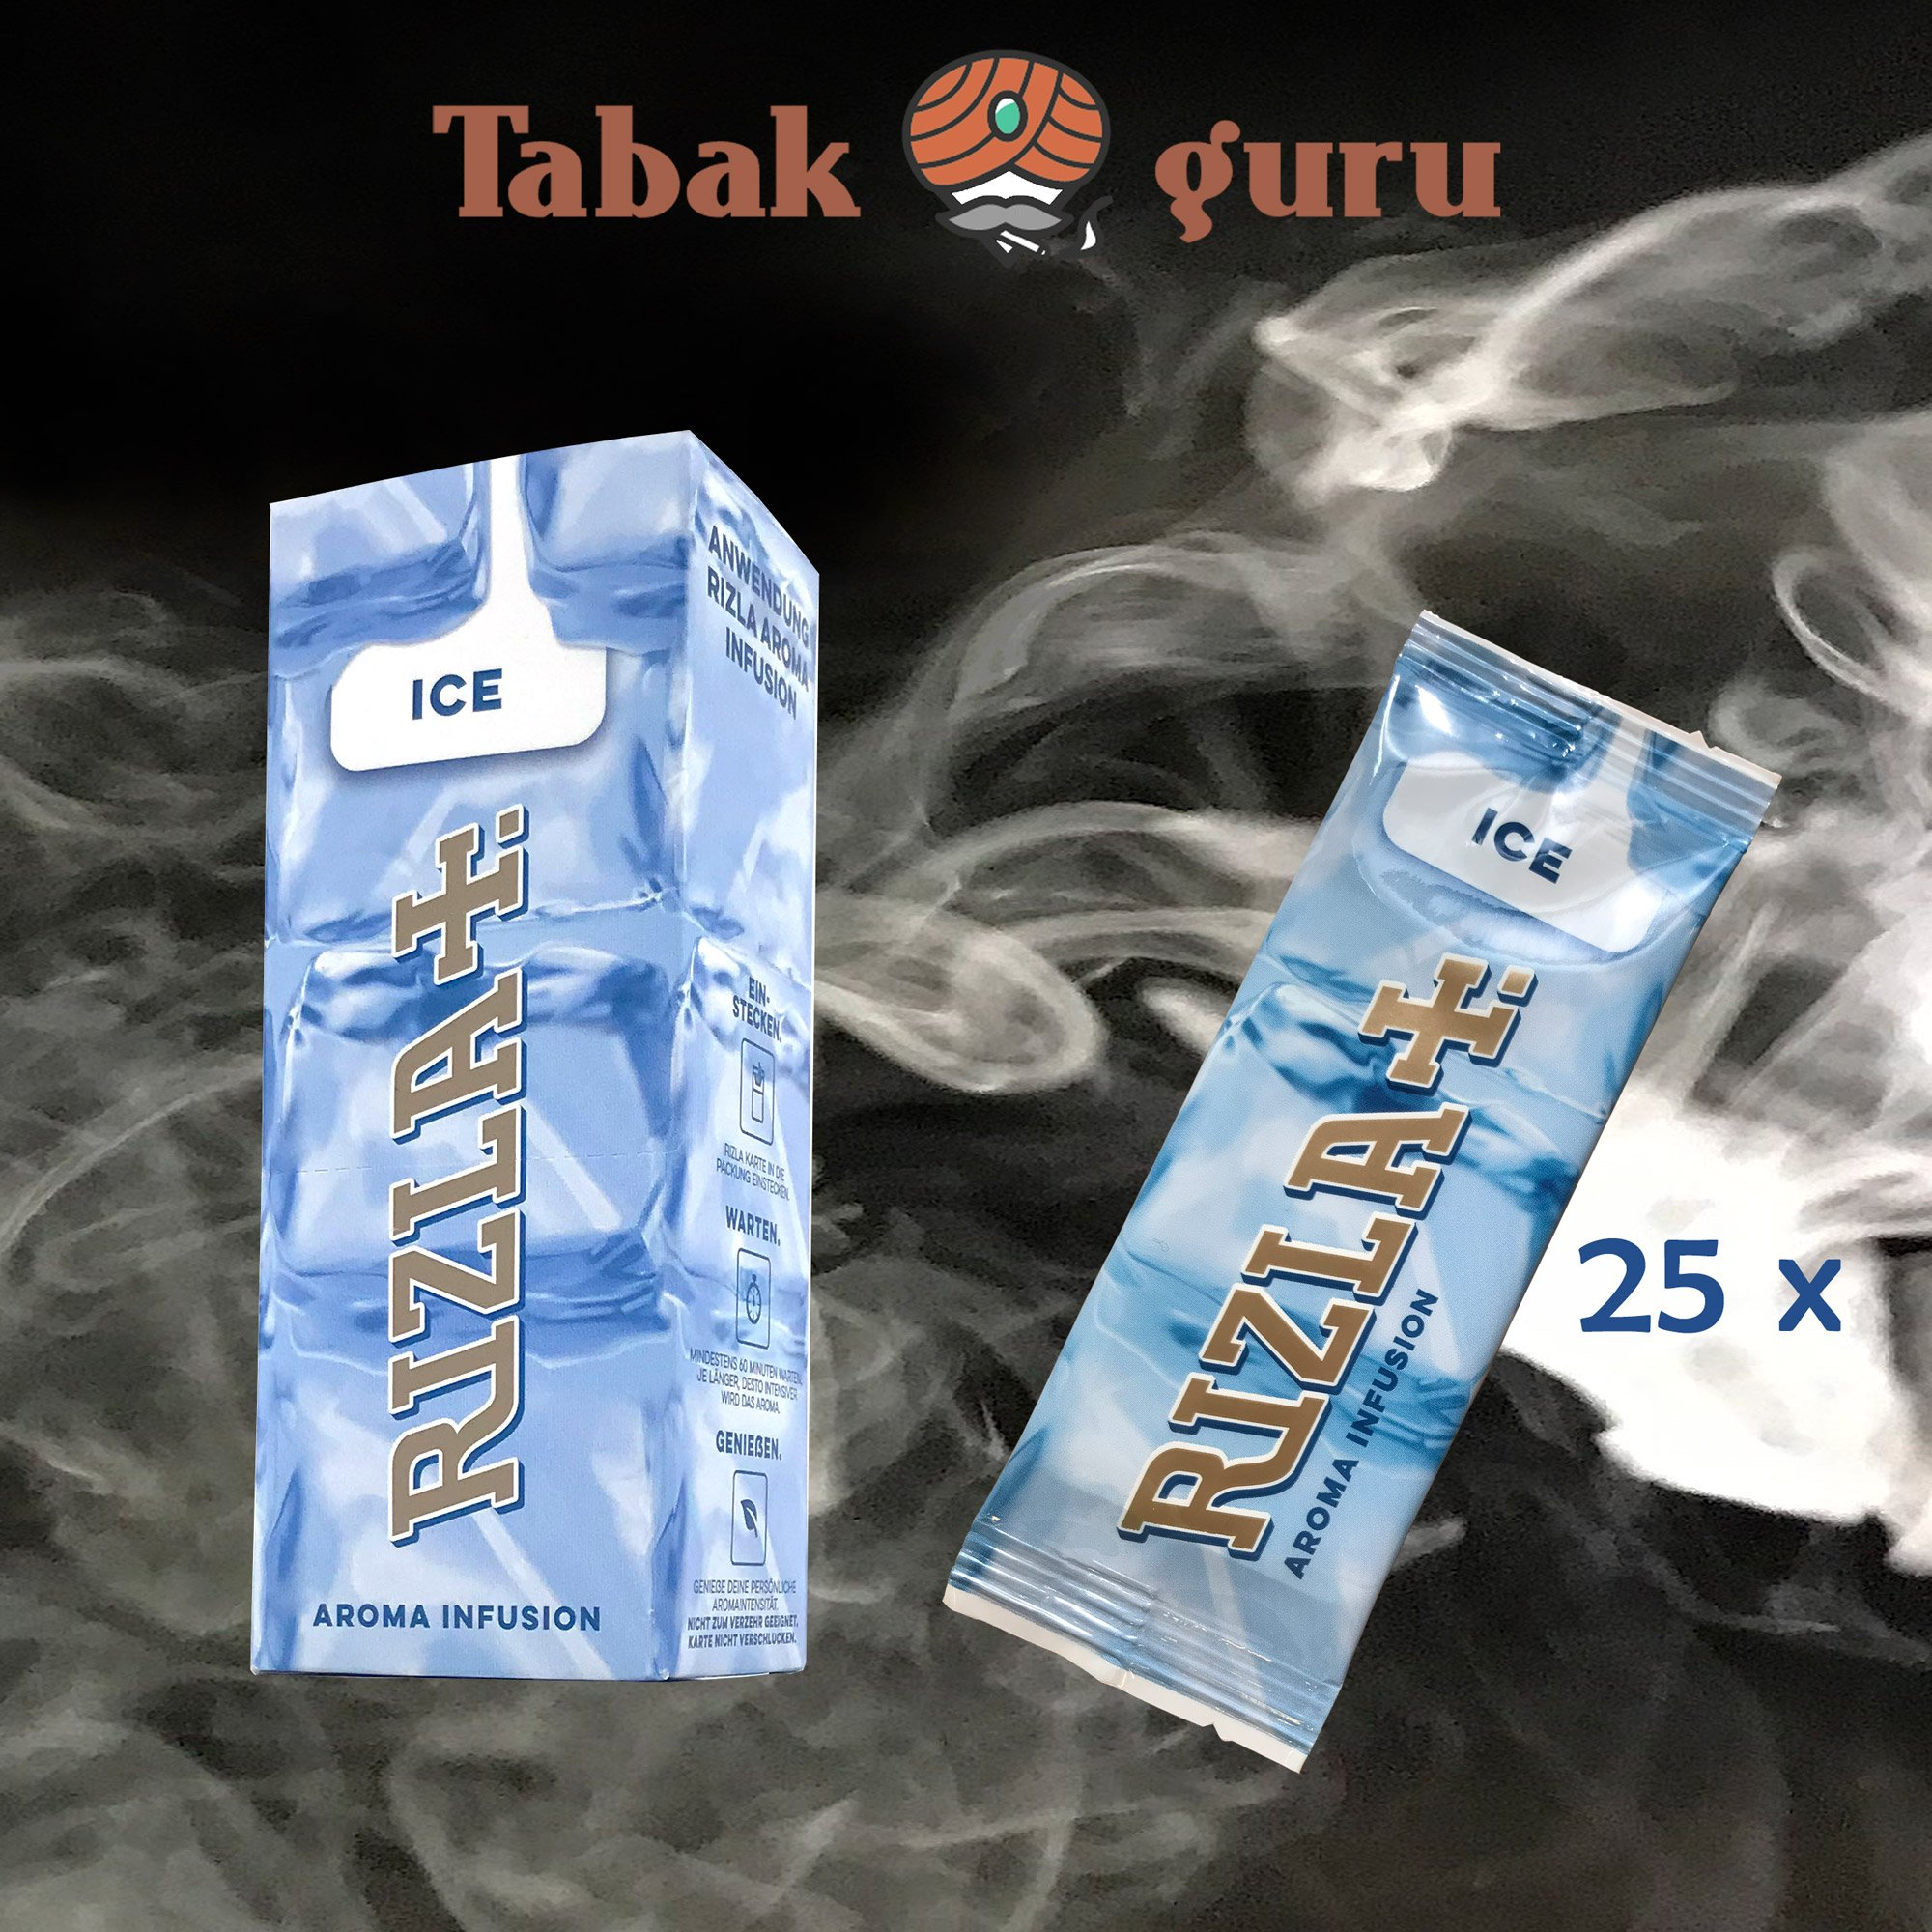 25 x Aromakarte Rizla+  ICE Aroma Infusion